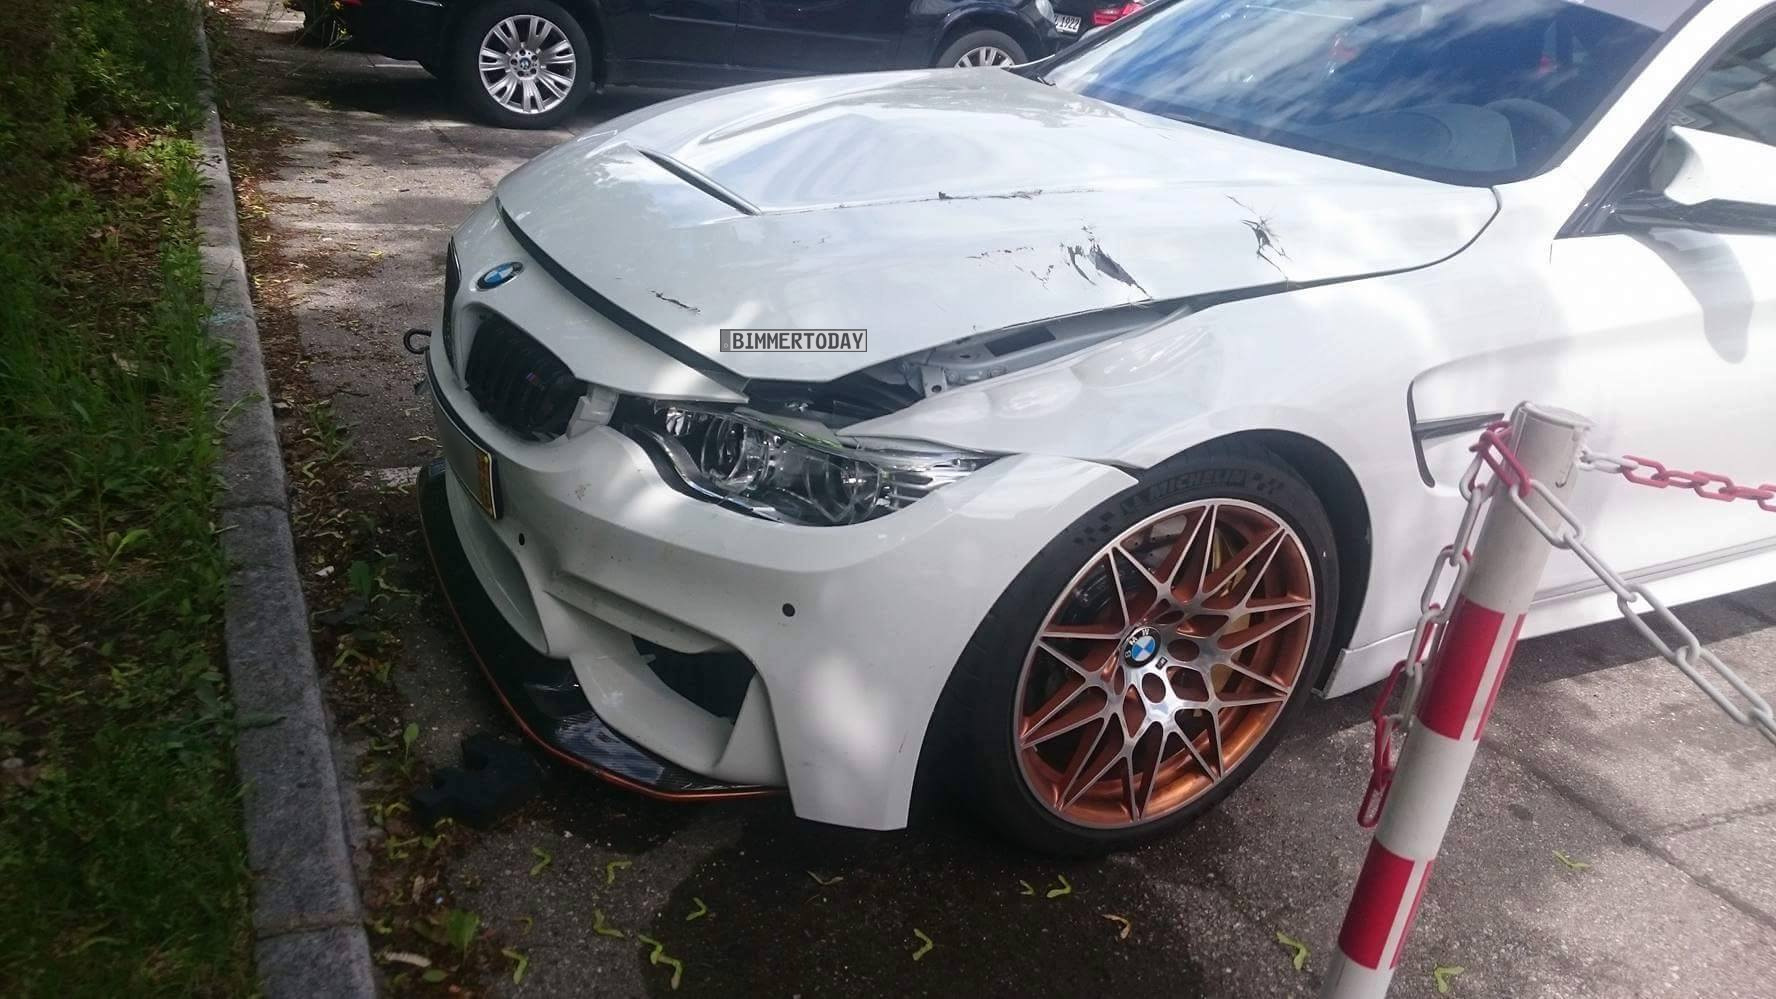 Exklusive Fotos Erster Bmw M4 Gts Bei Unfall Beschadigt